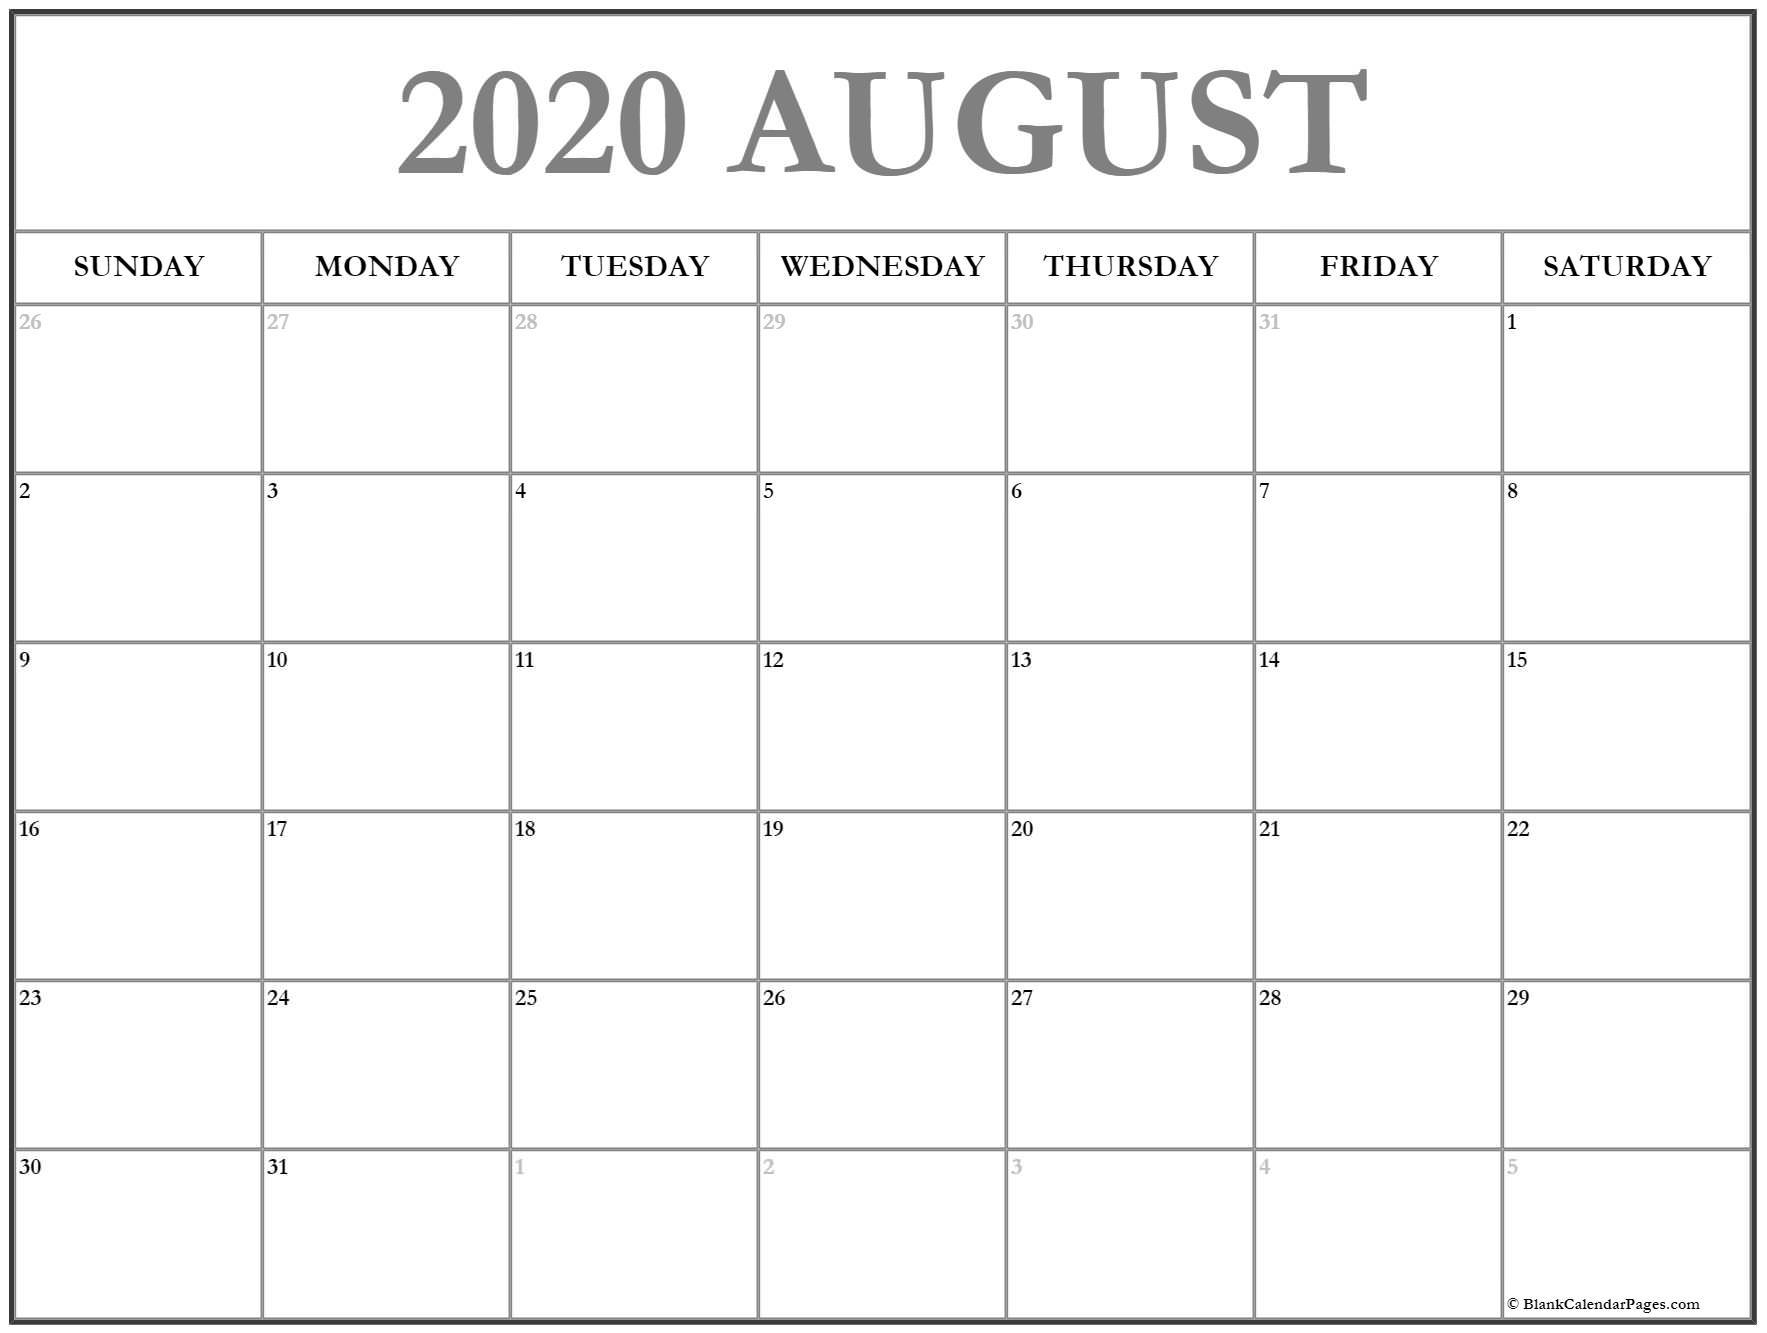 August 2020 Calendar | Free Printable Monthly Calendars regarding 2020 Printable Calendar By Month